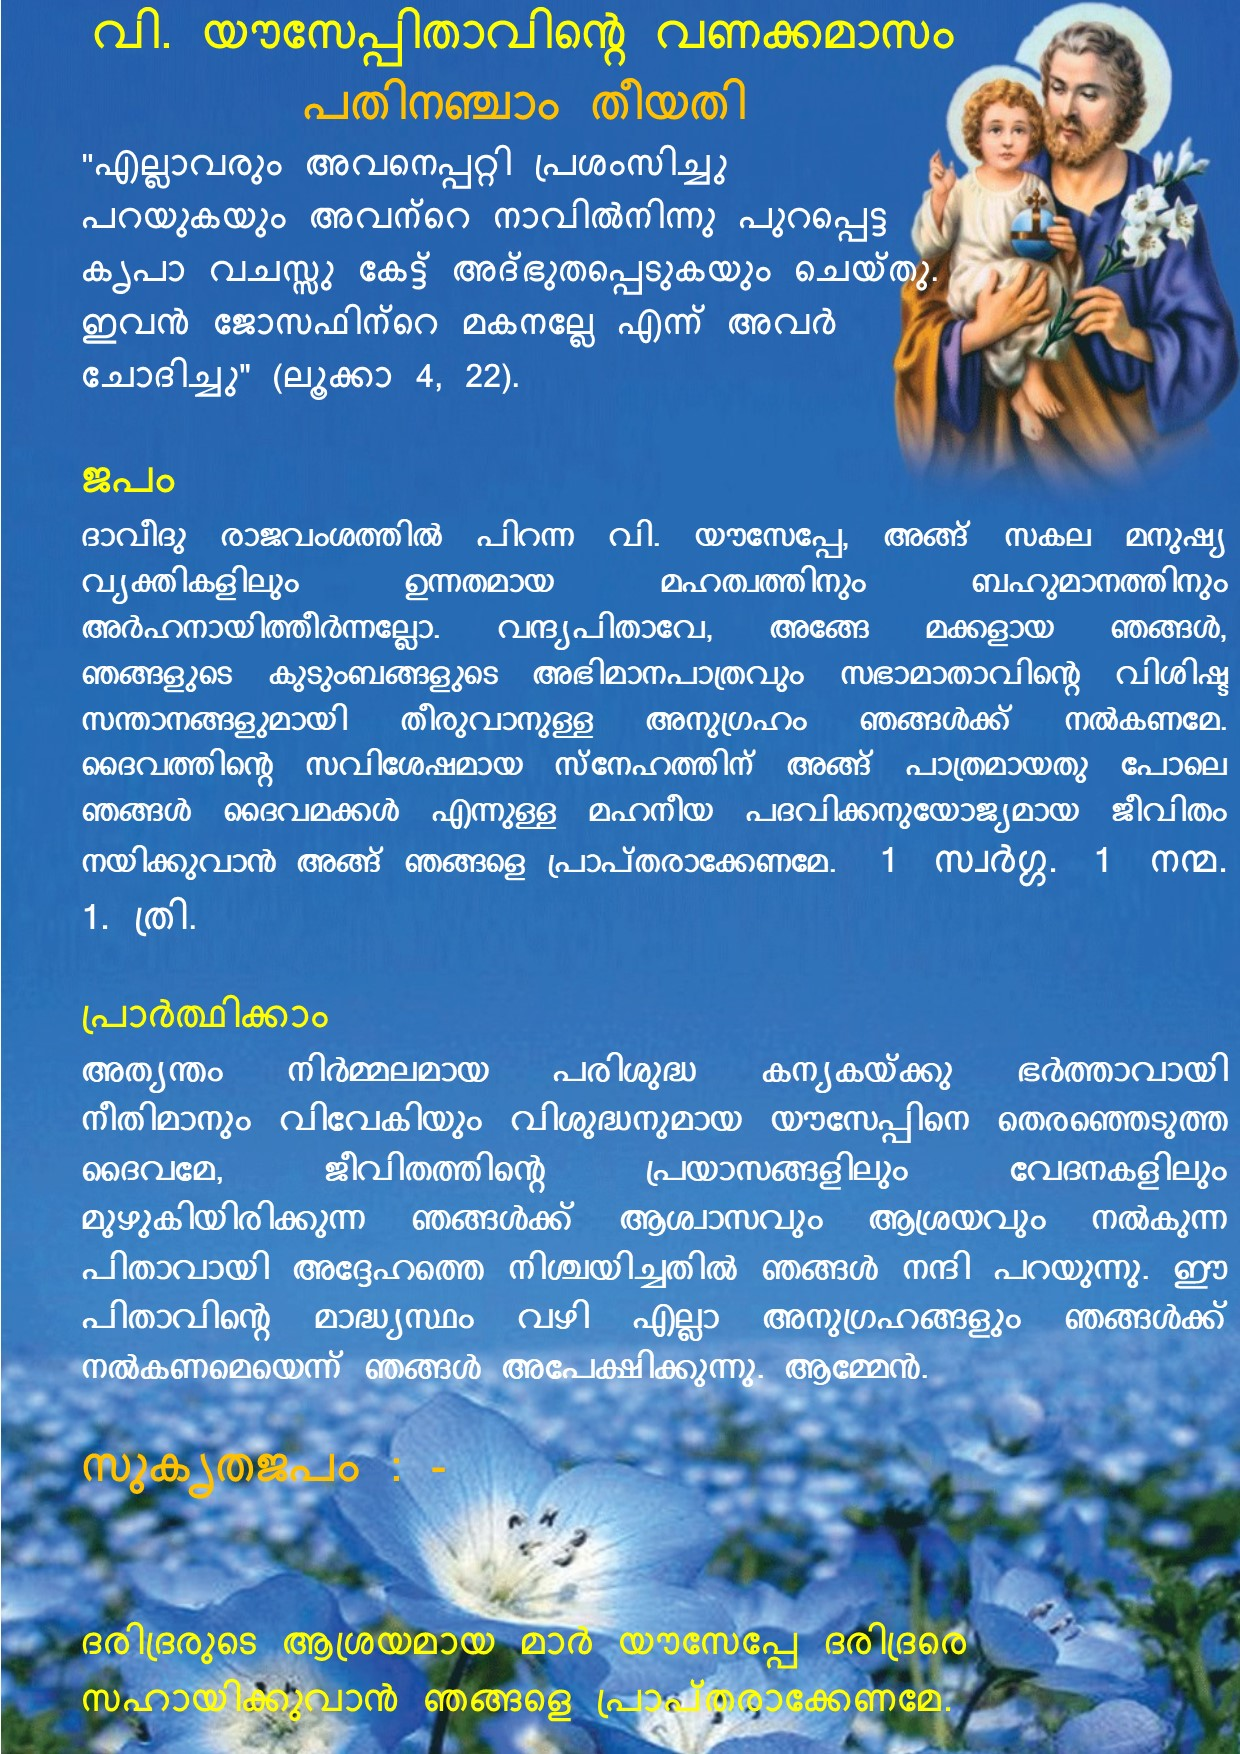 Vanakkamasam, St Joseph, March 15